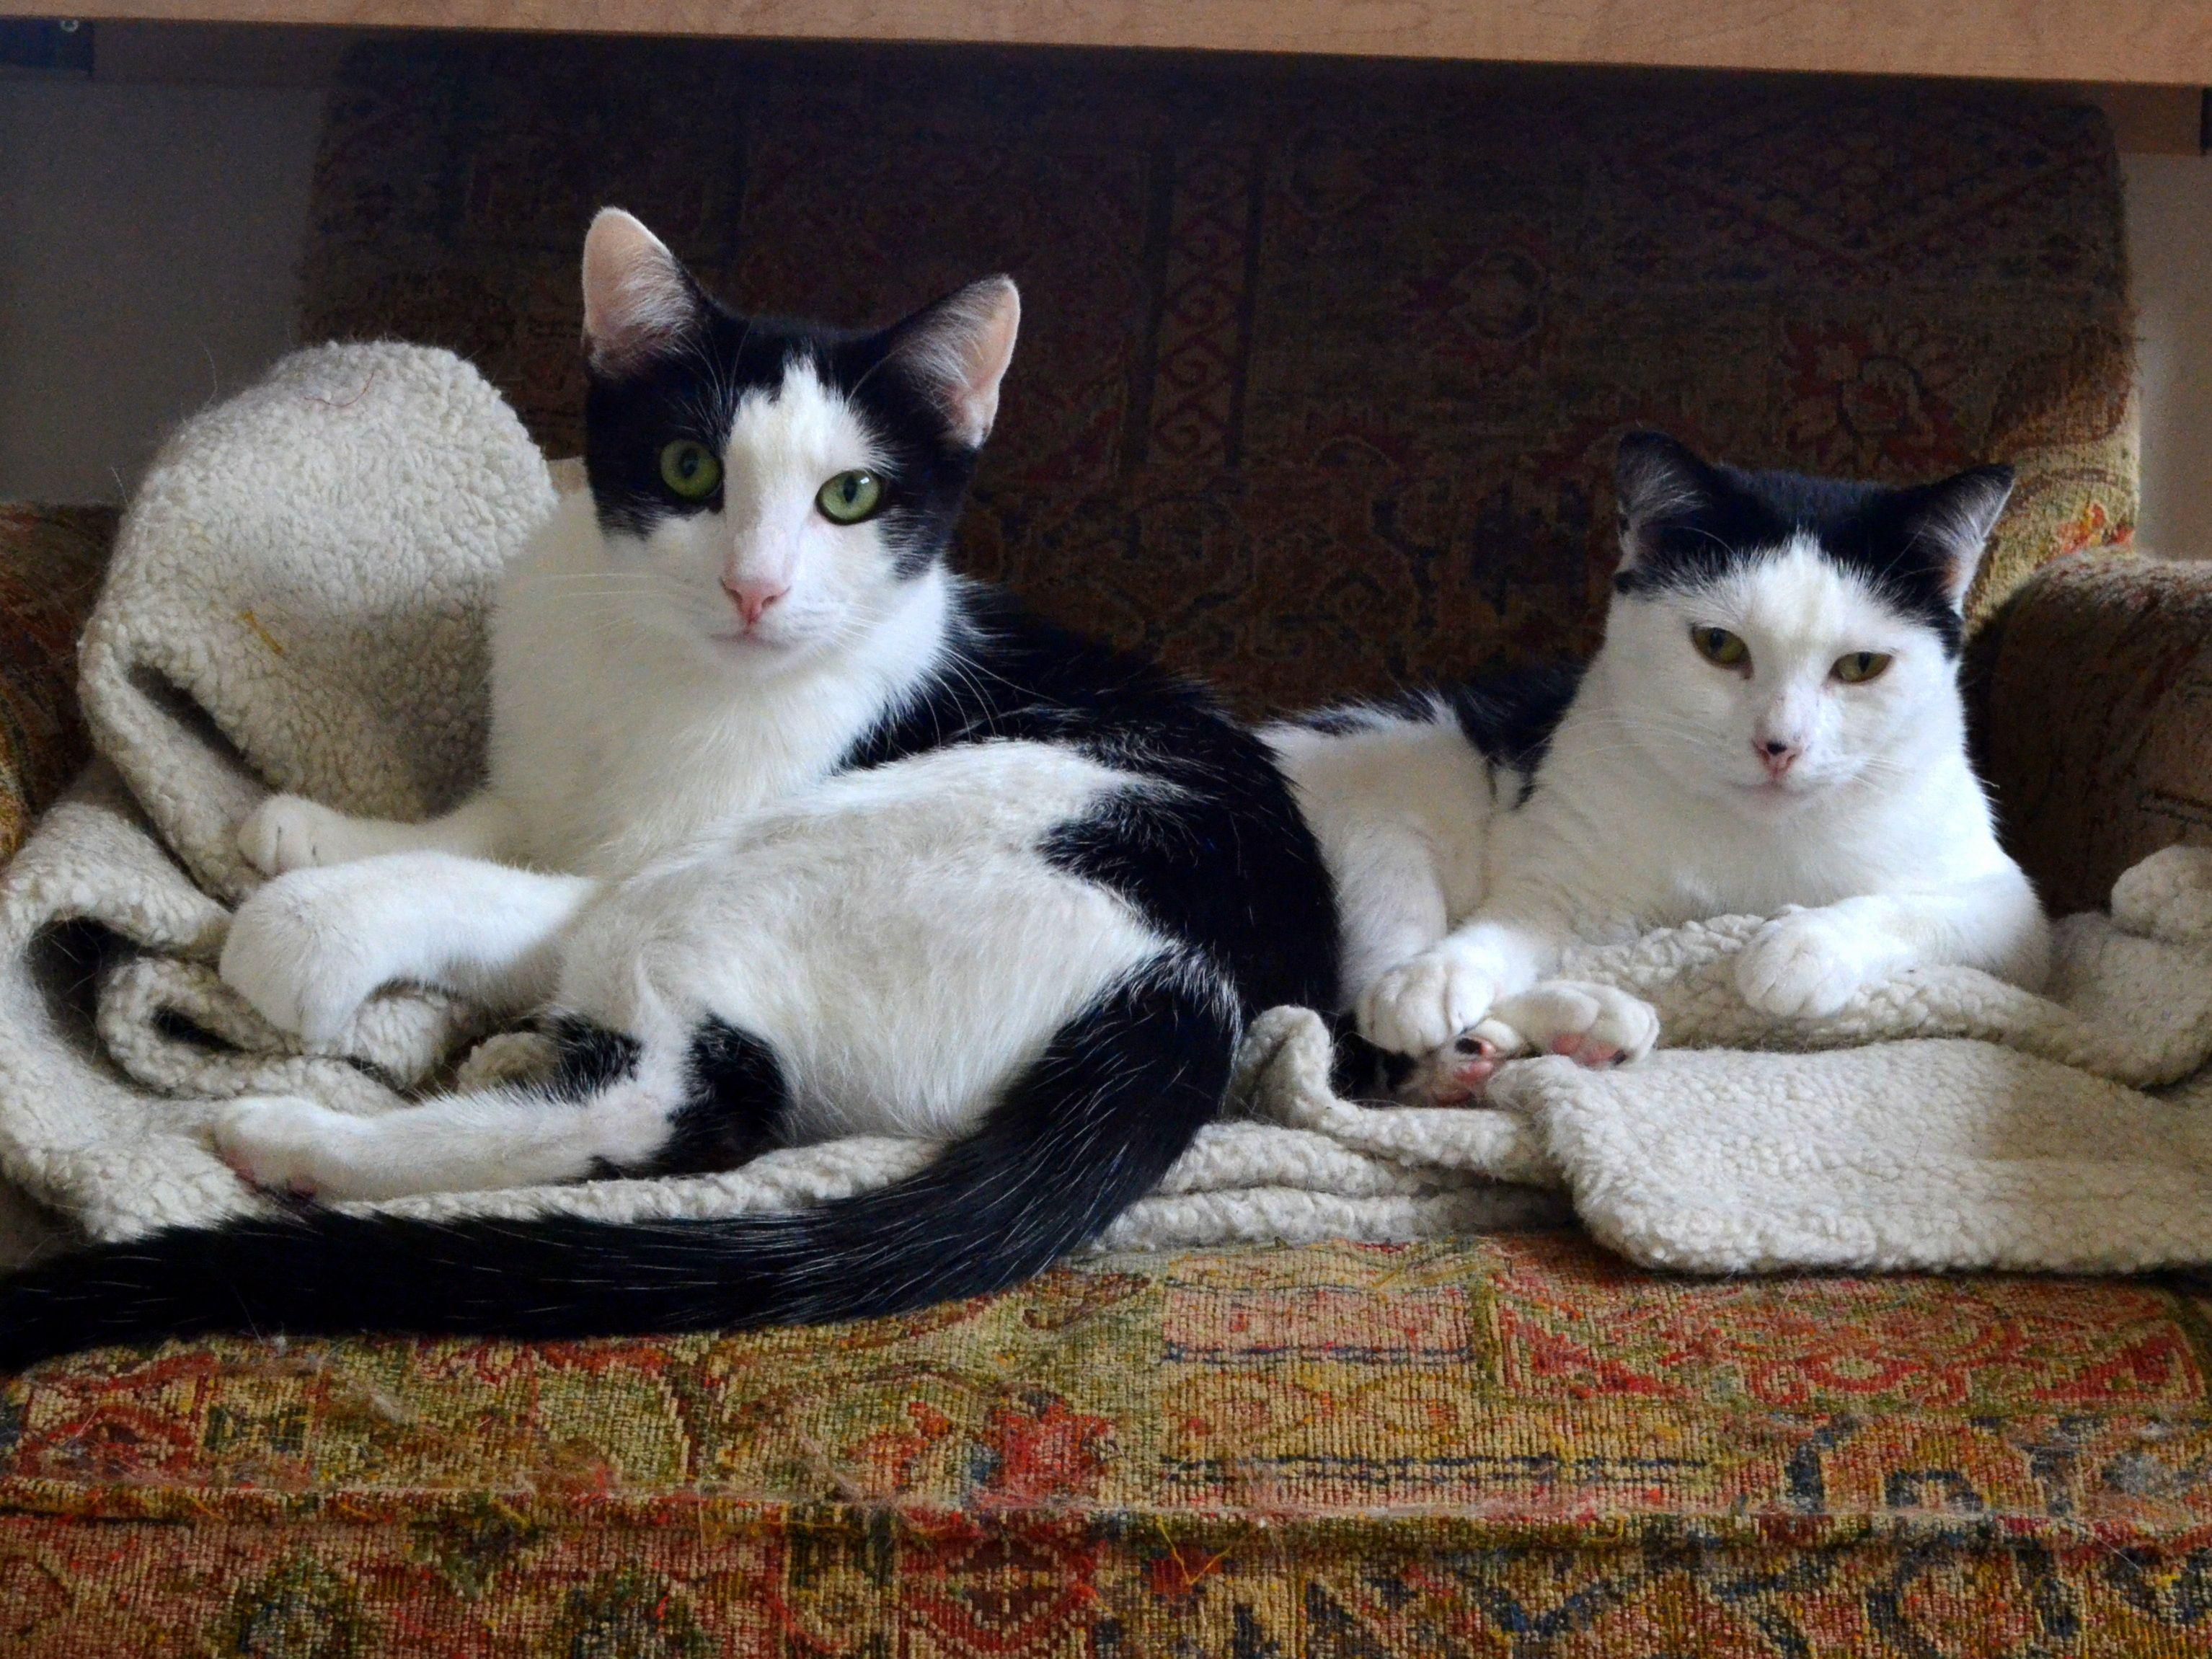 Dsc 0006 Cat People Cats Animals